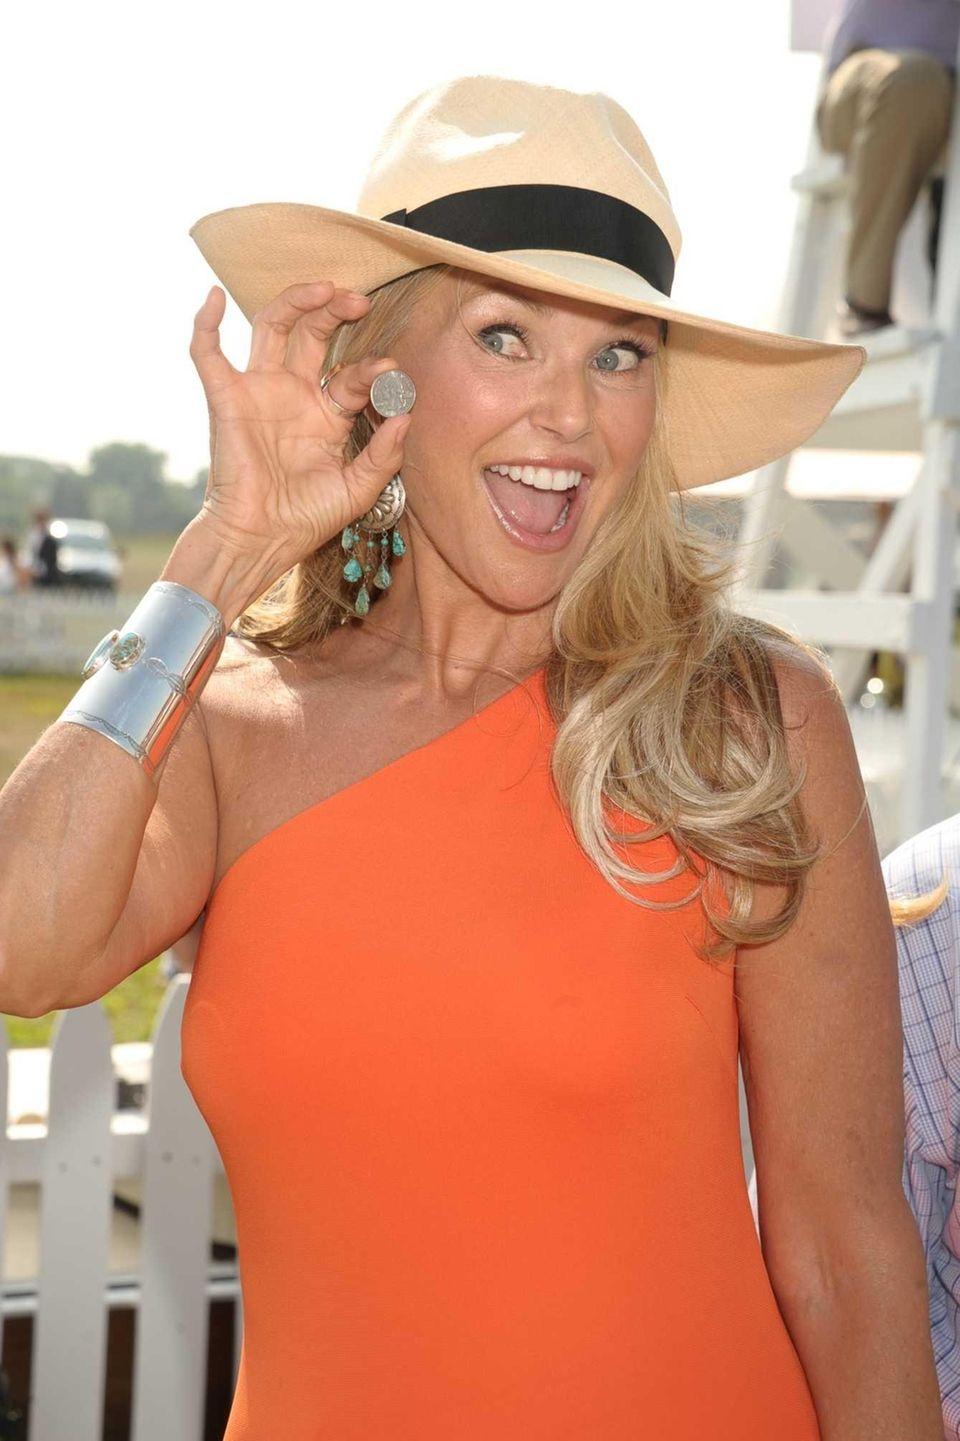 Christie Brinkley attends the 17th Annual Bridgehampton Polo